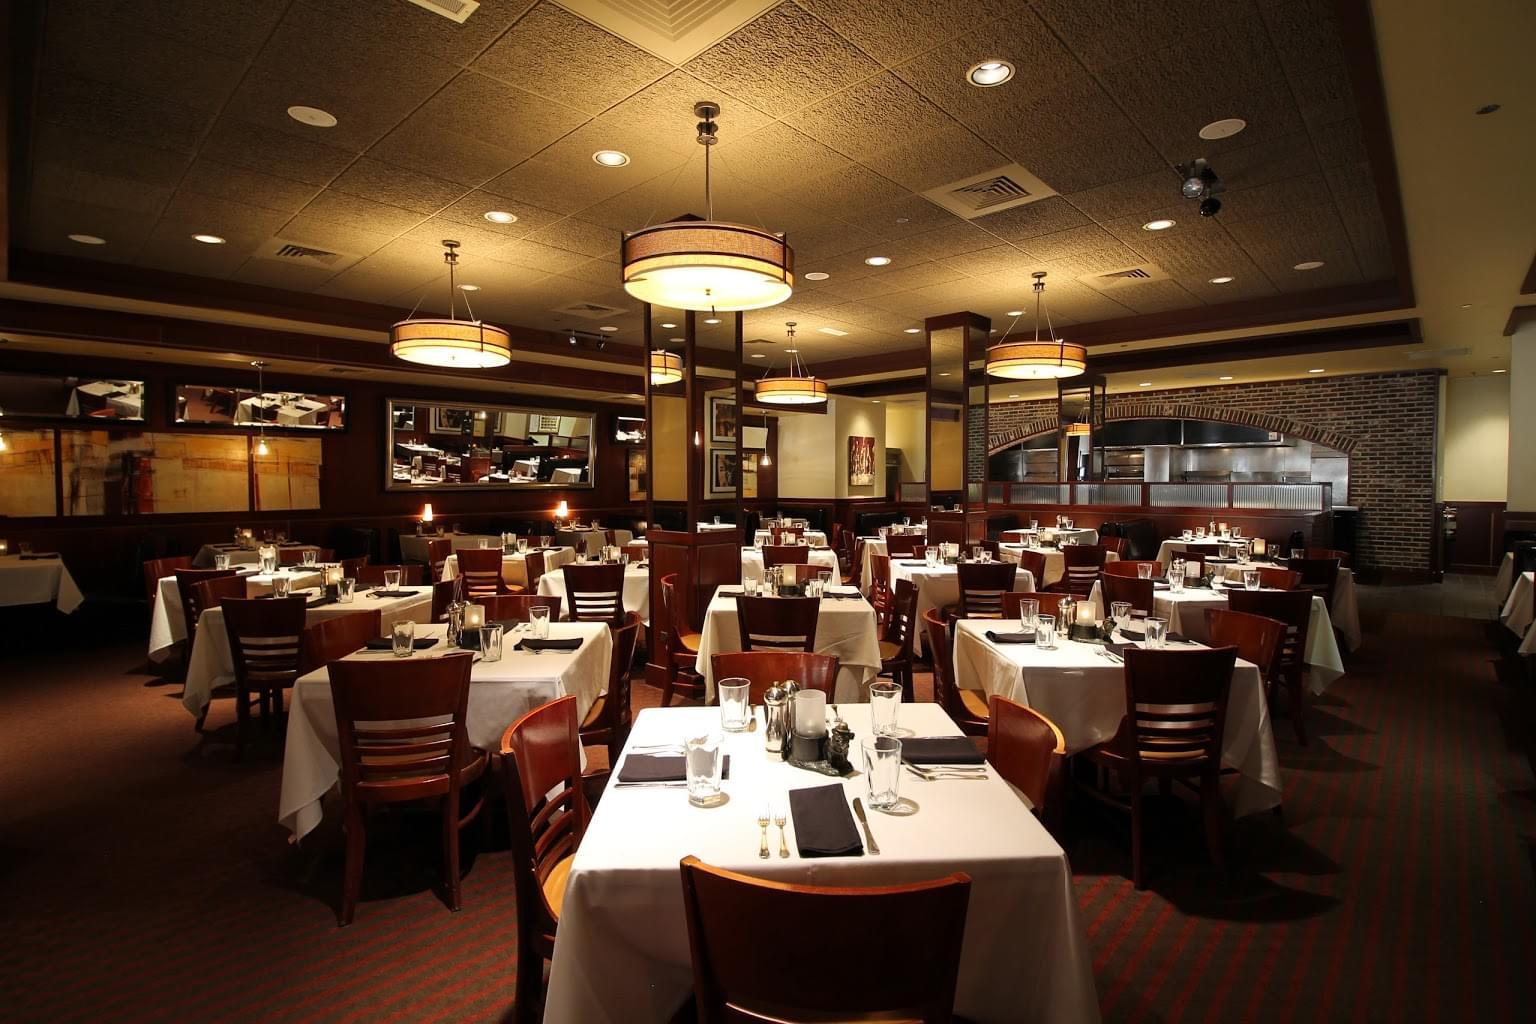 Sullivan's Steakhouse Chicago, IL dining area